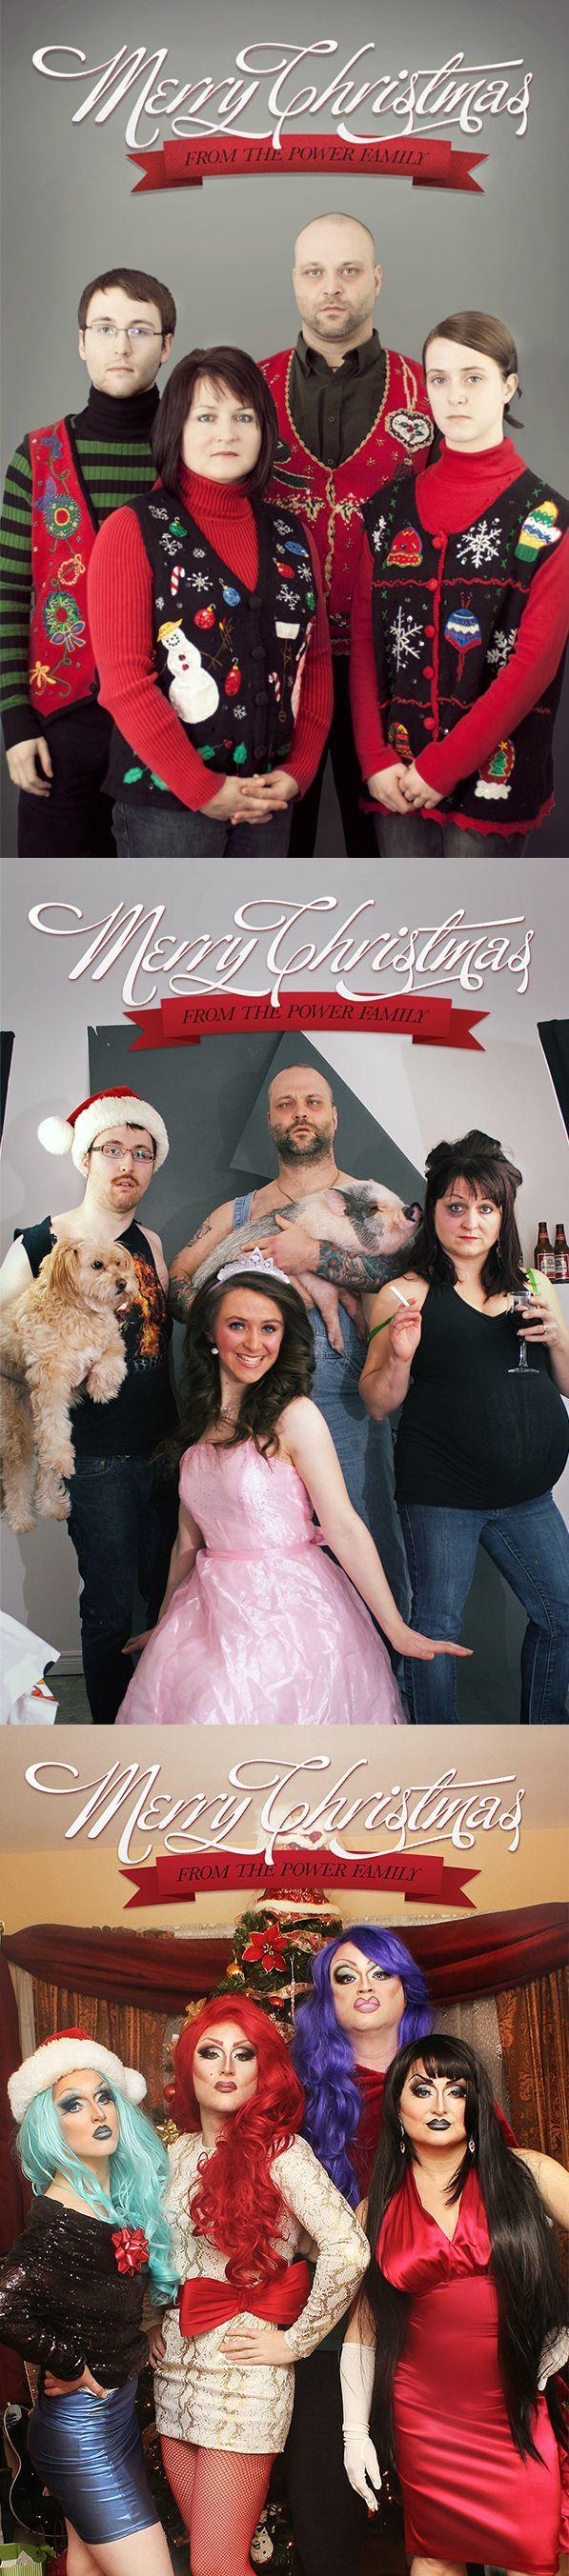 Three Years of Christmas Family Photos...awkward family photos (yet still kinda awesome)!